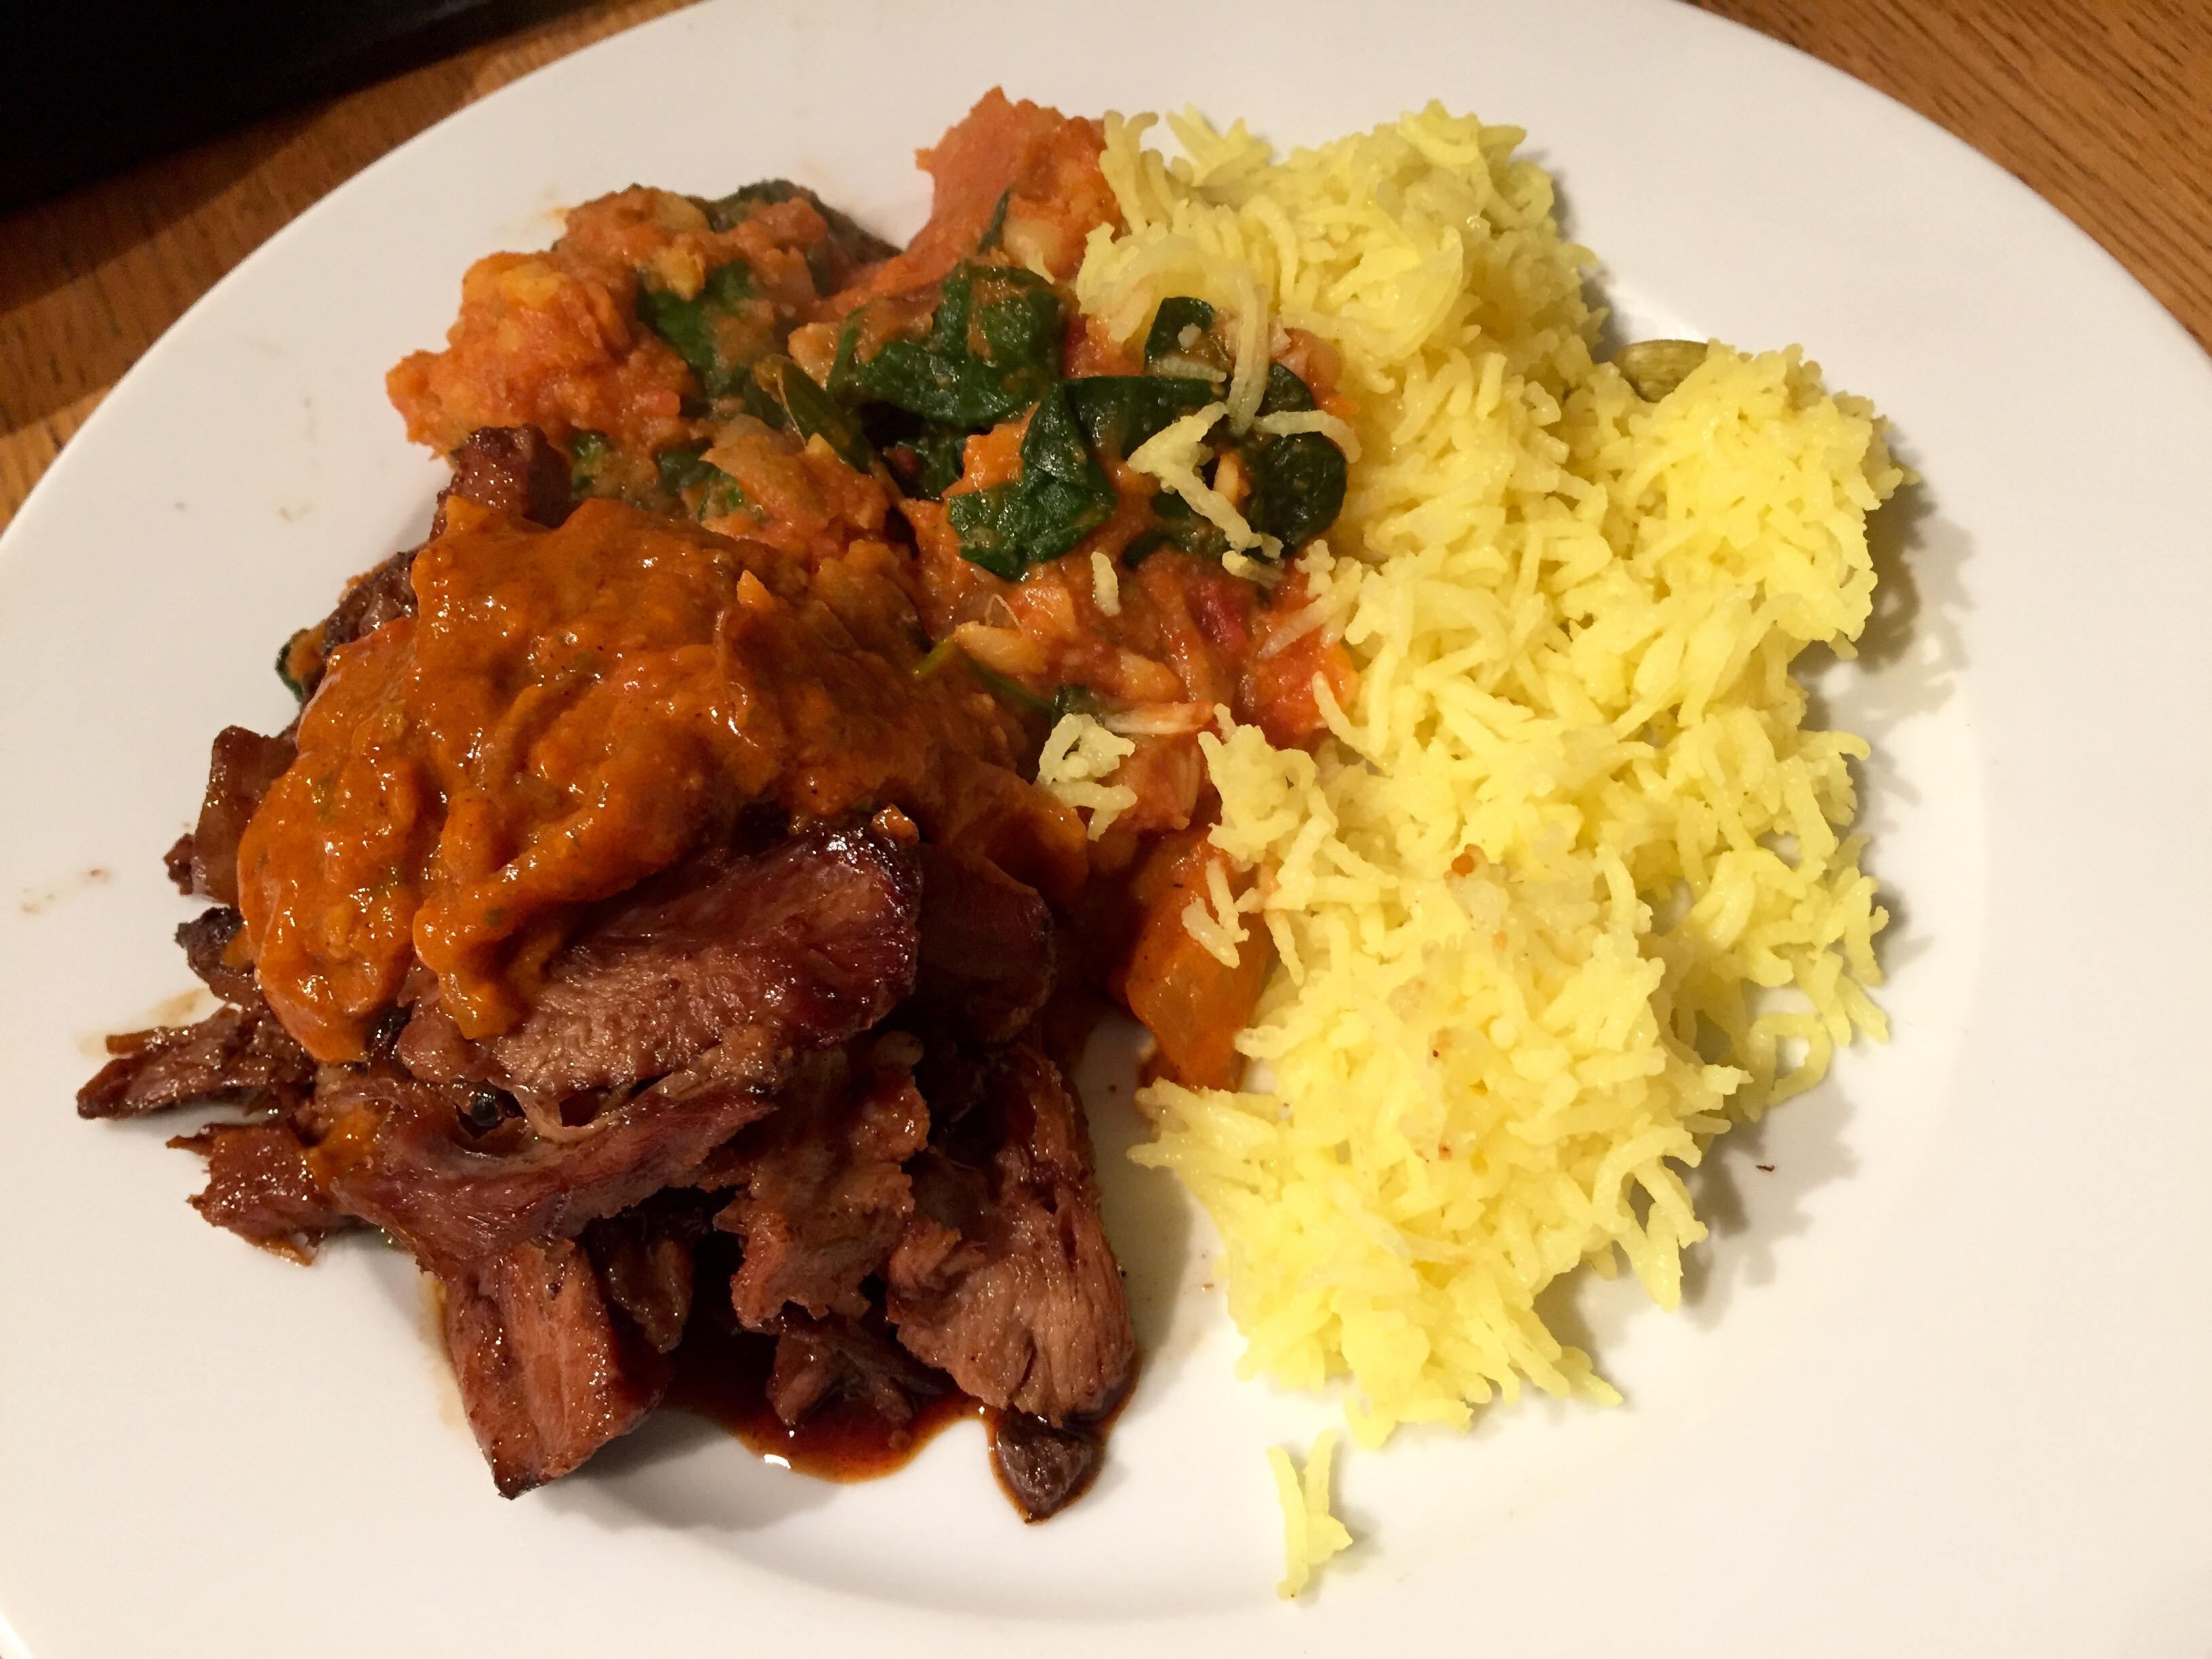 Lamb, rice and roti